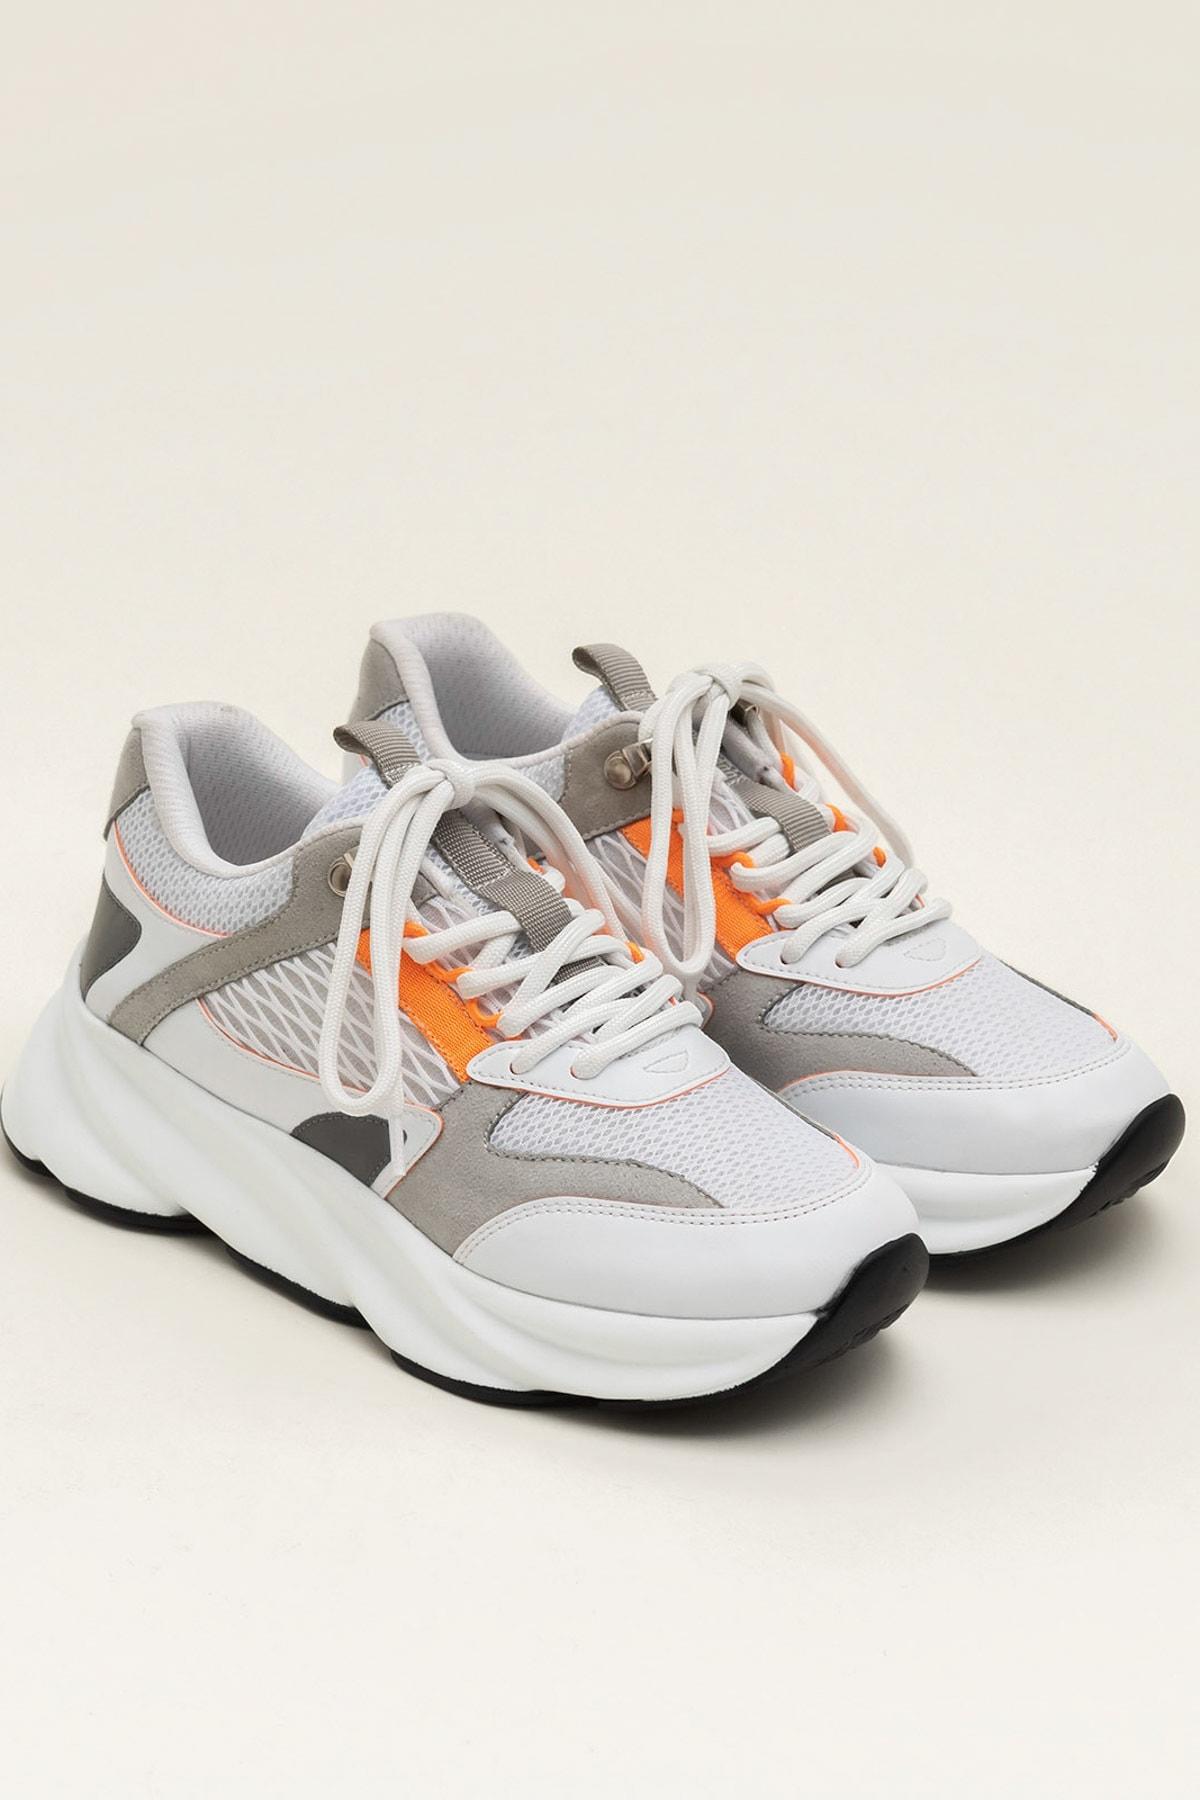 Elle Shoes ANJELA Turuncu Neon Kadın  Sneaker 20YKN5205 2